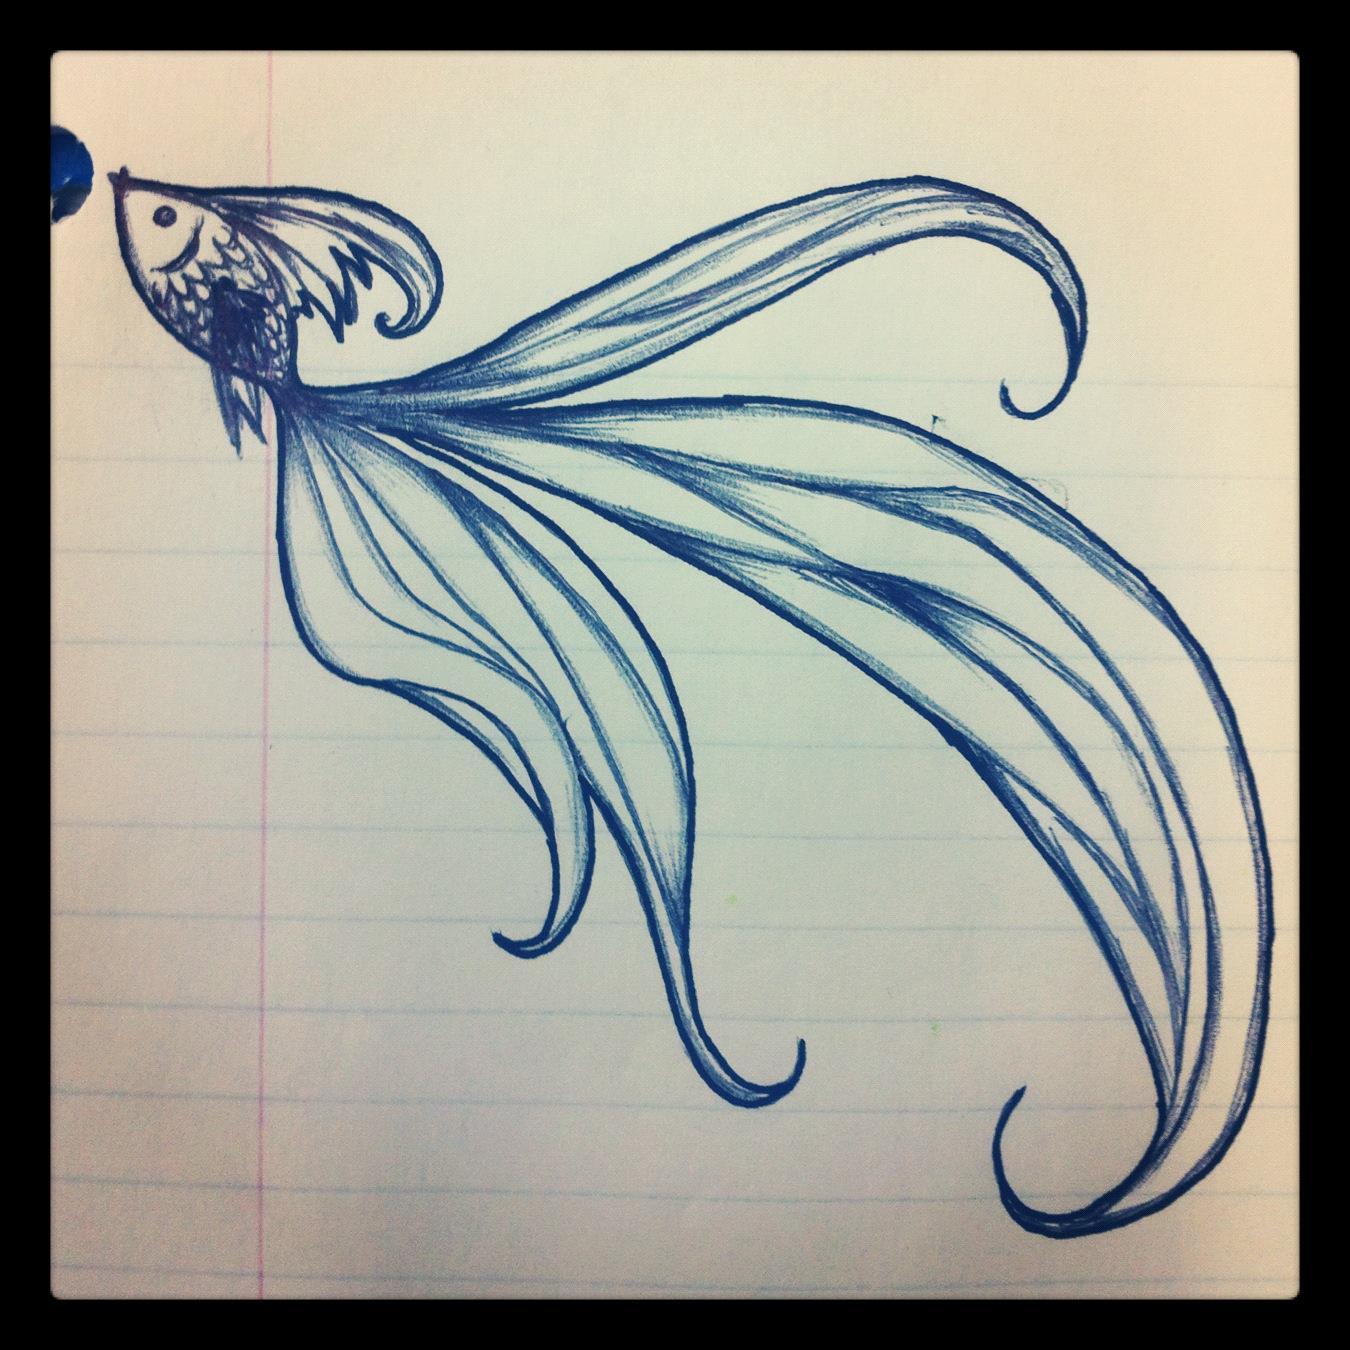 1350x1350 Beautiful Fish Drawing. Turn Into Tattoo Maybe. Really Pretty